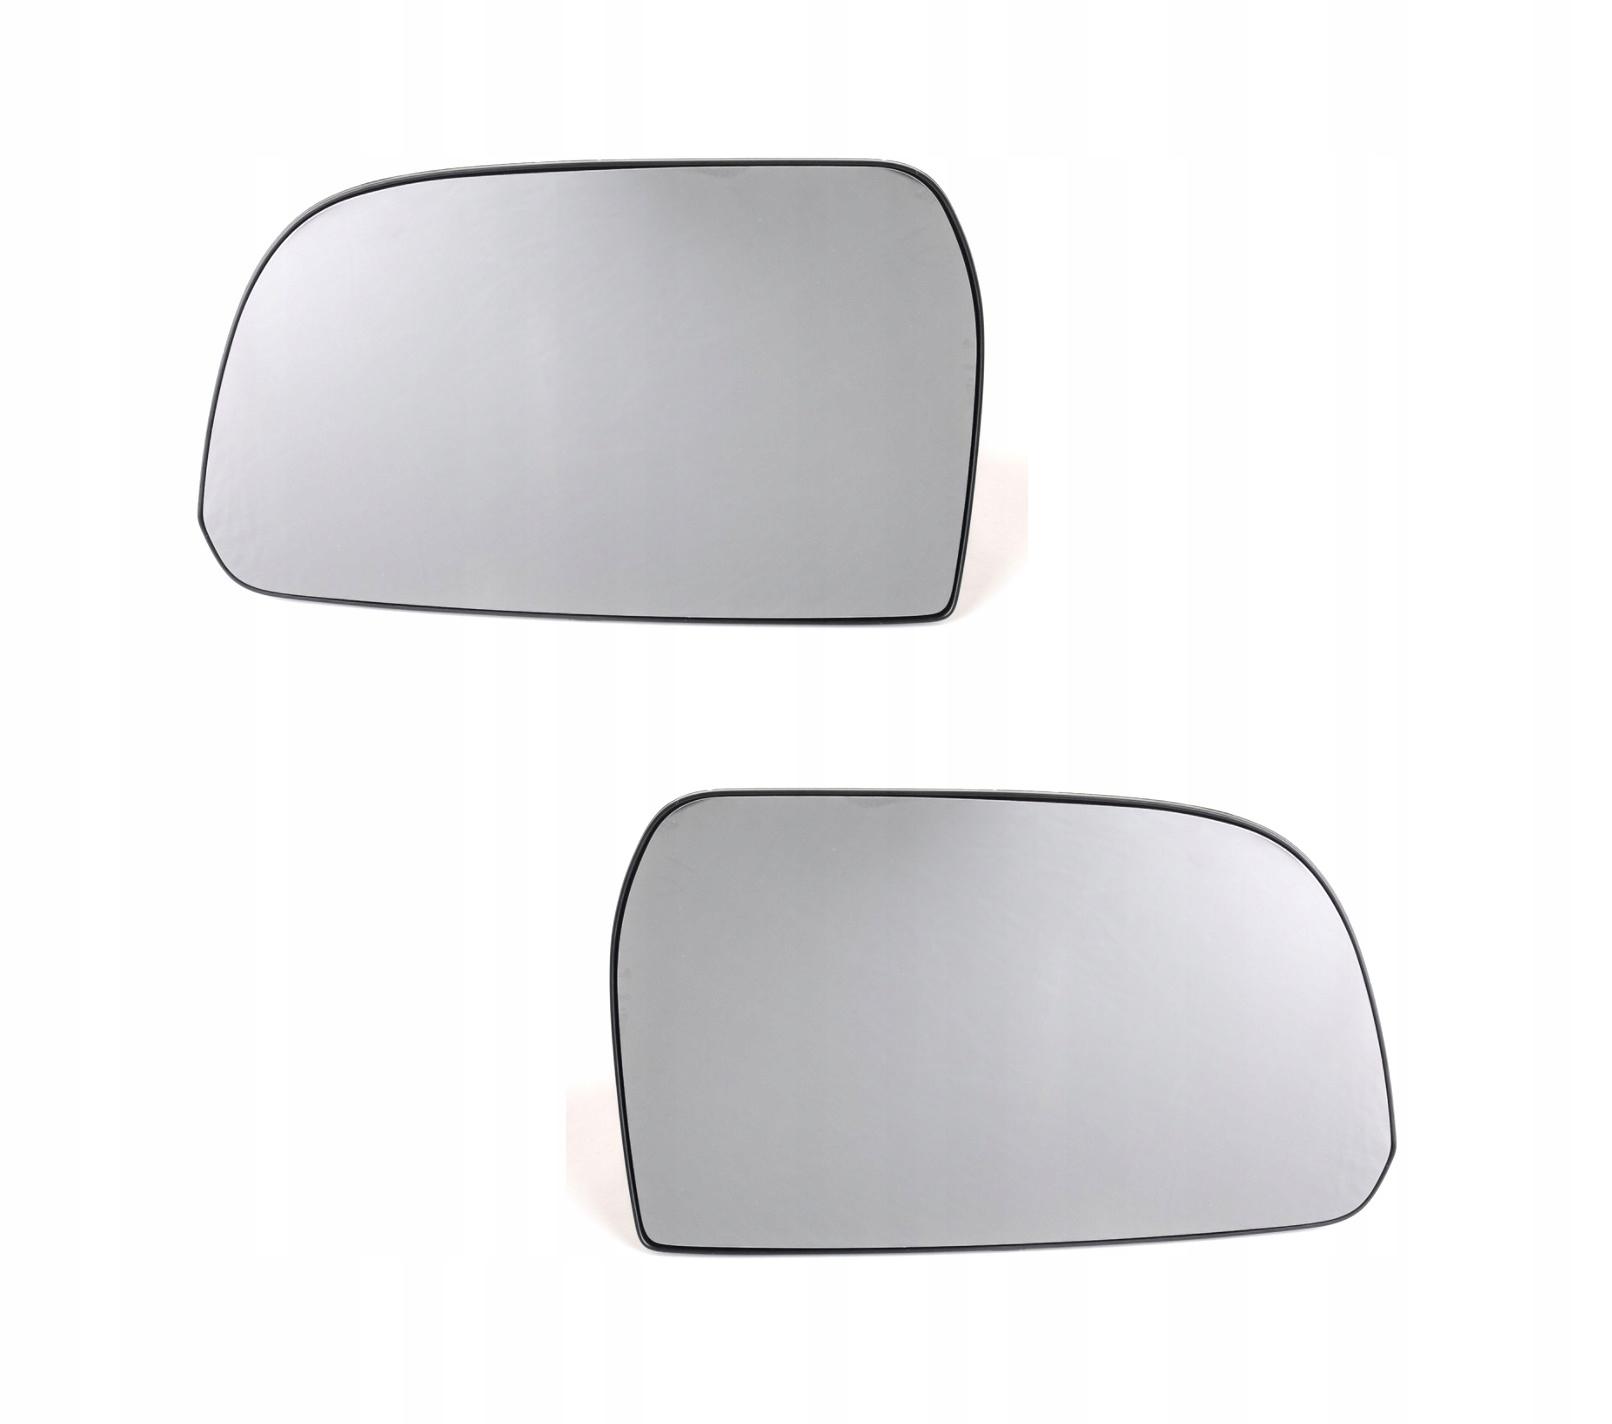 tucson 04-09 вклад зеркала str слева новый